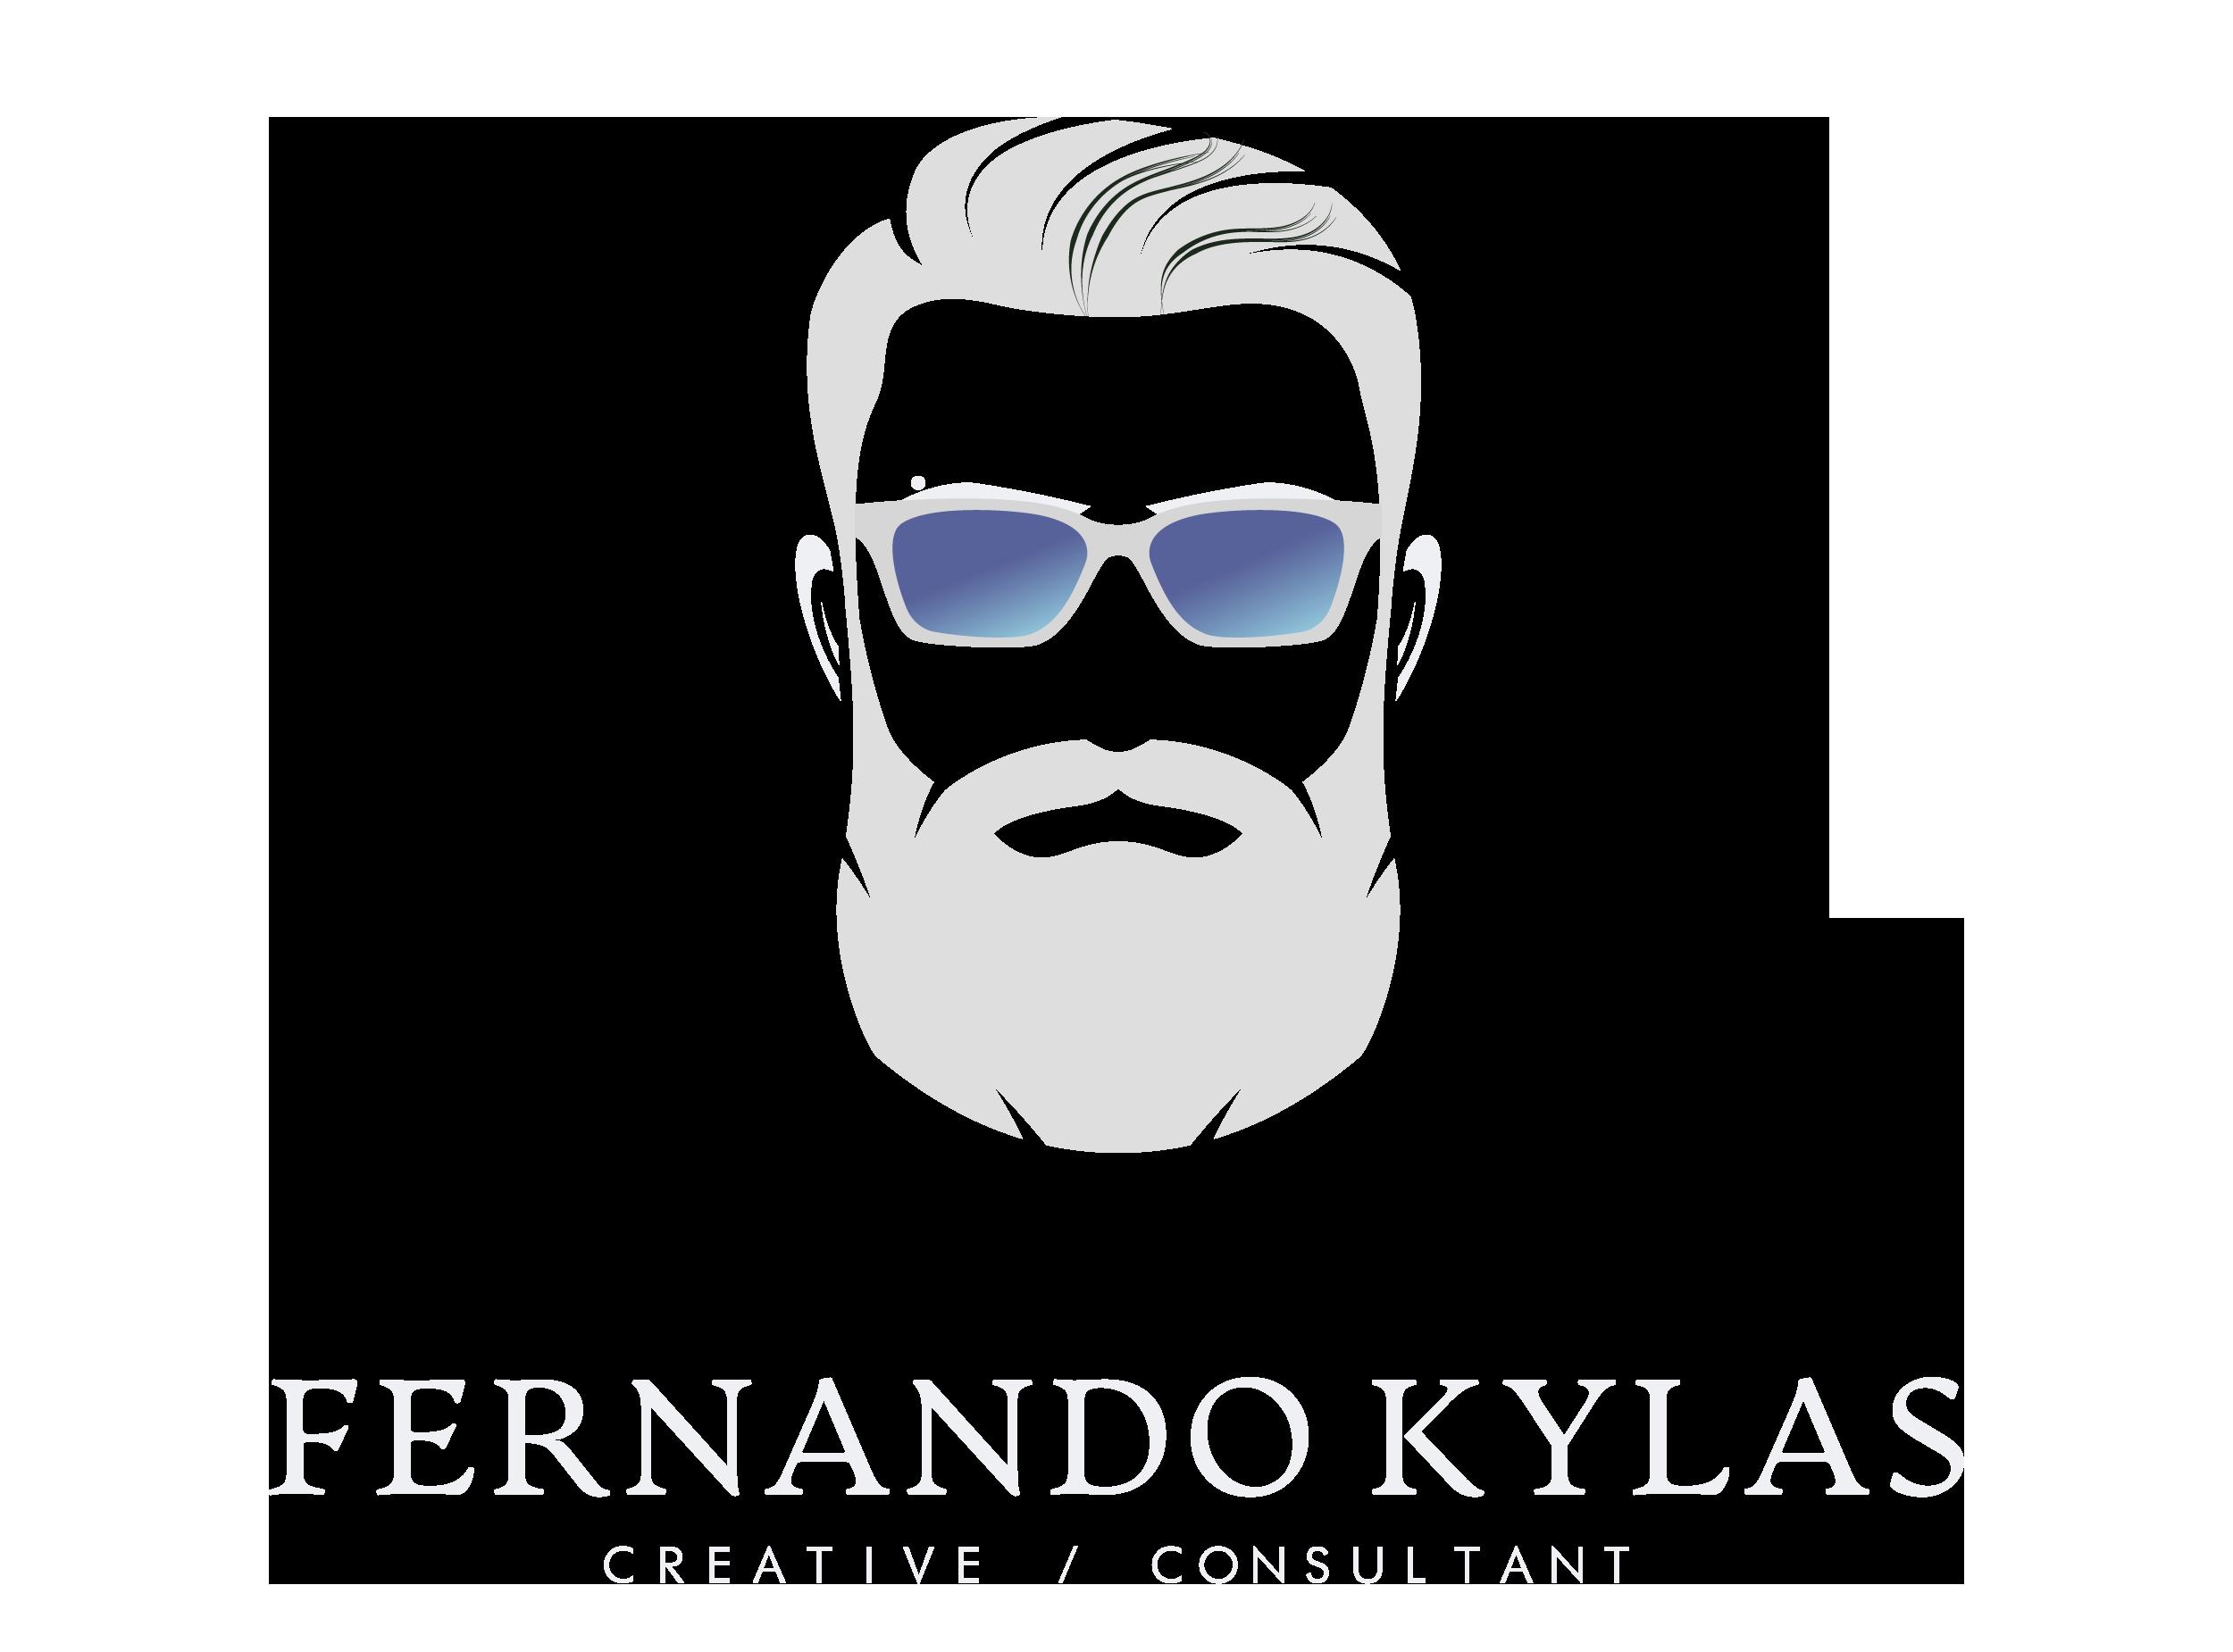 Fernando Kylas